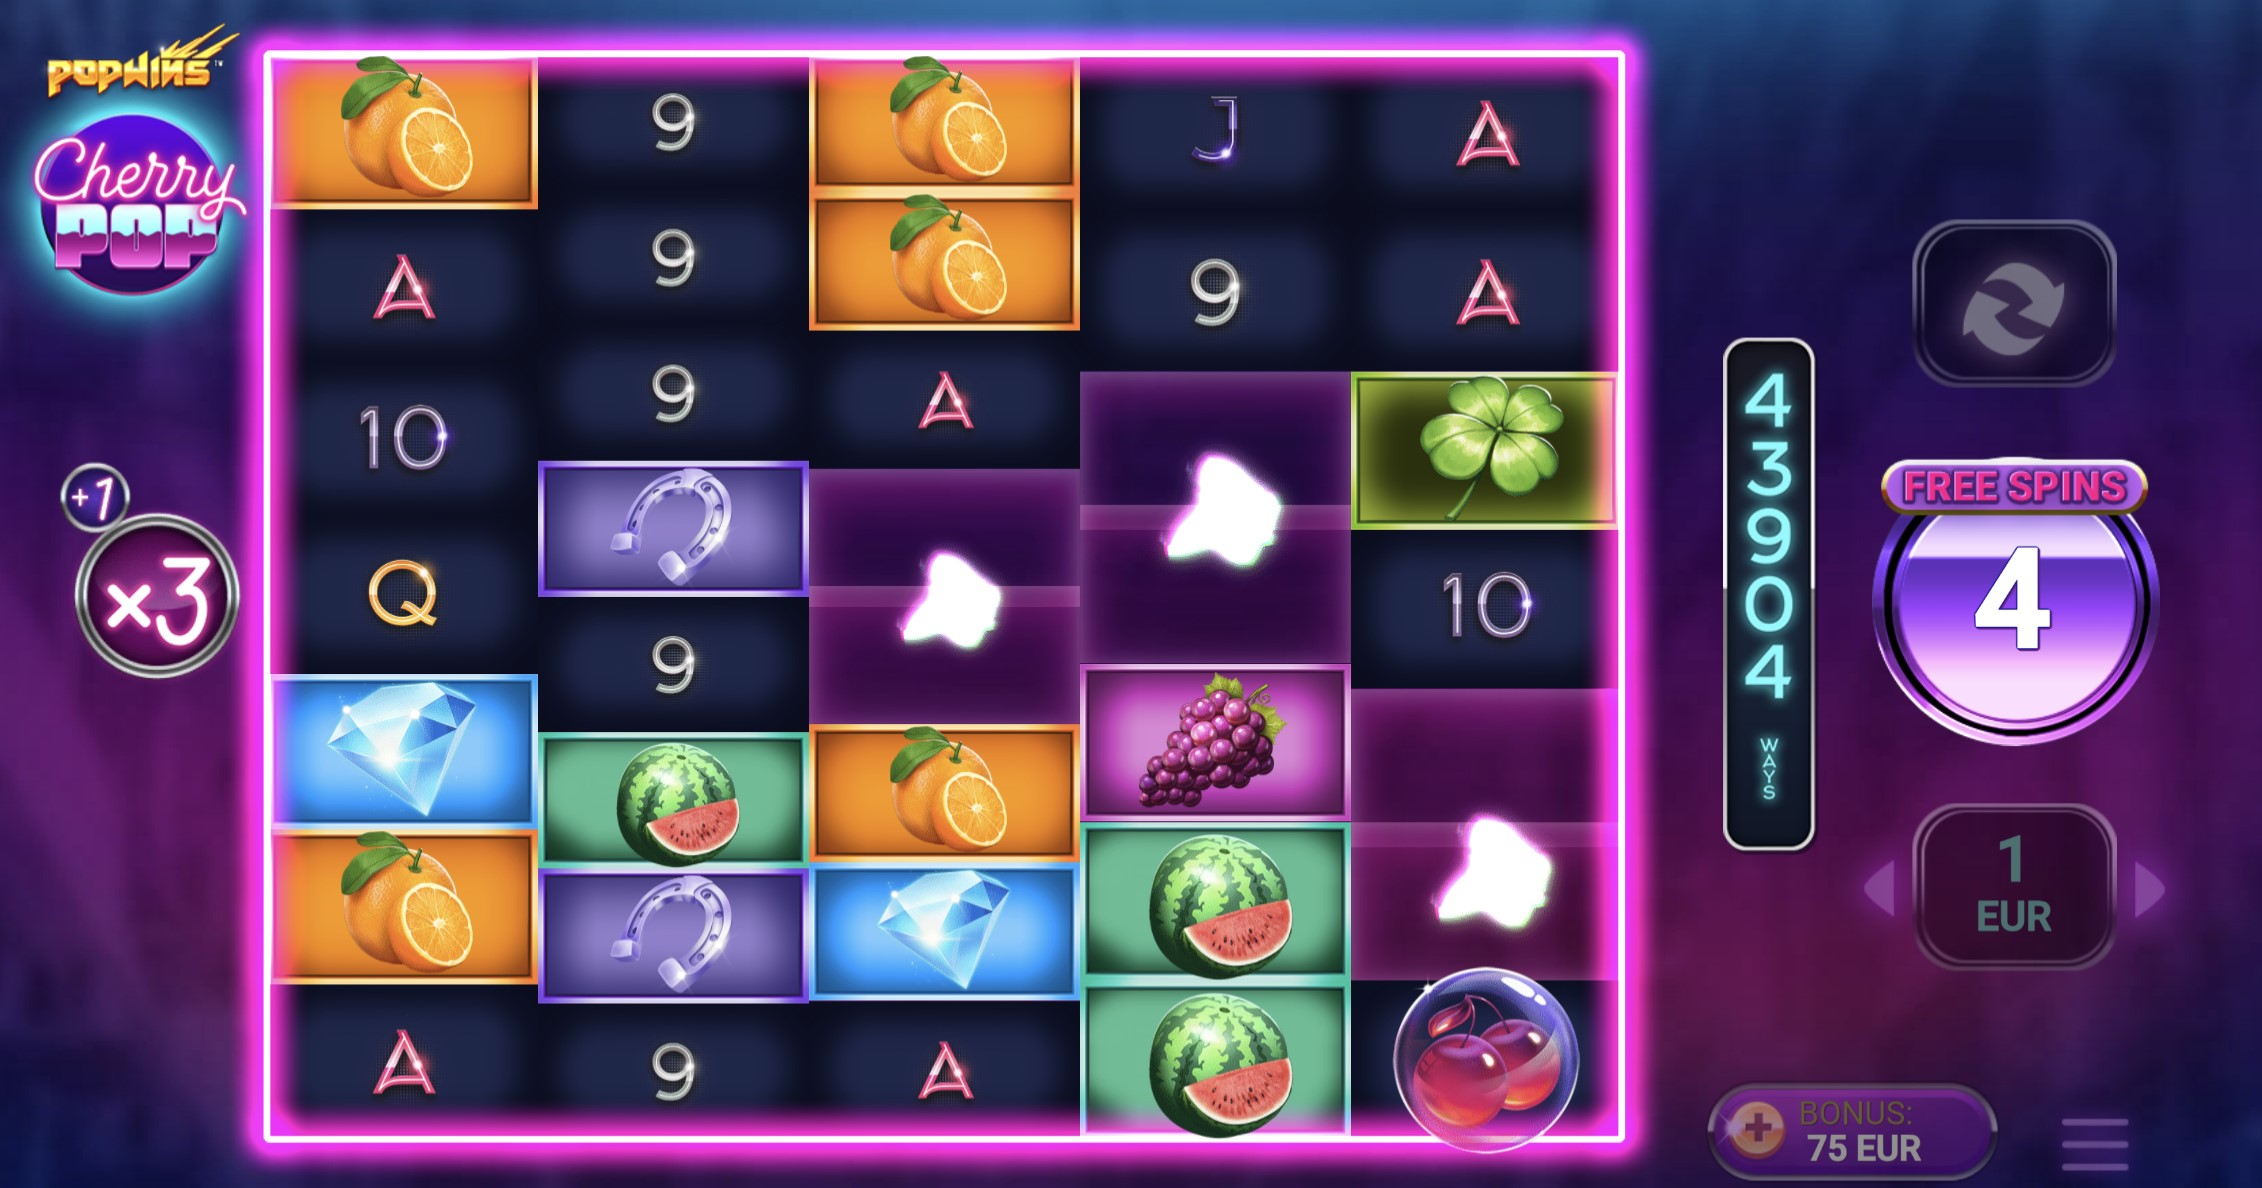 cherry pop slot free spins nemokami sukimai